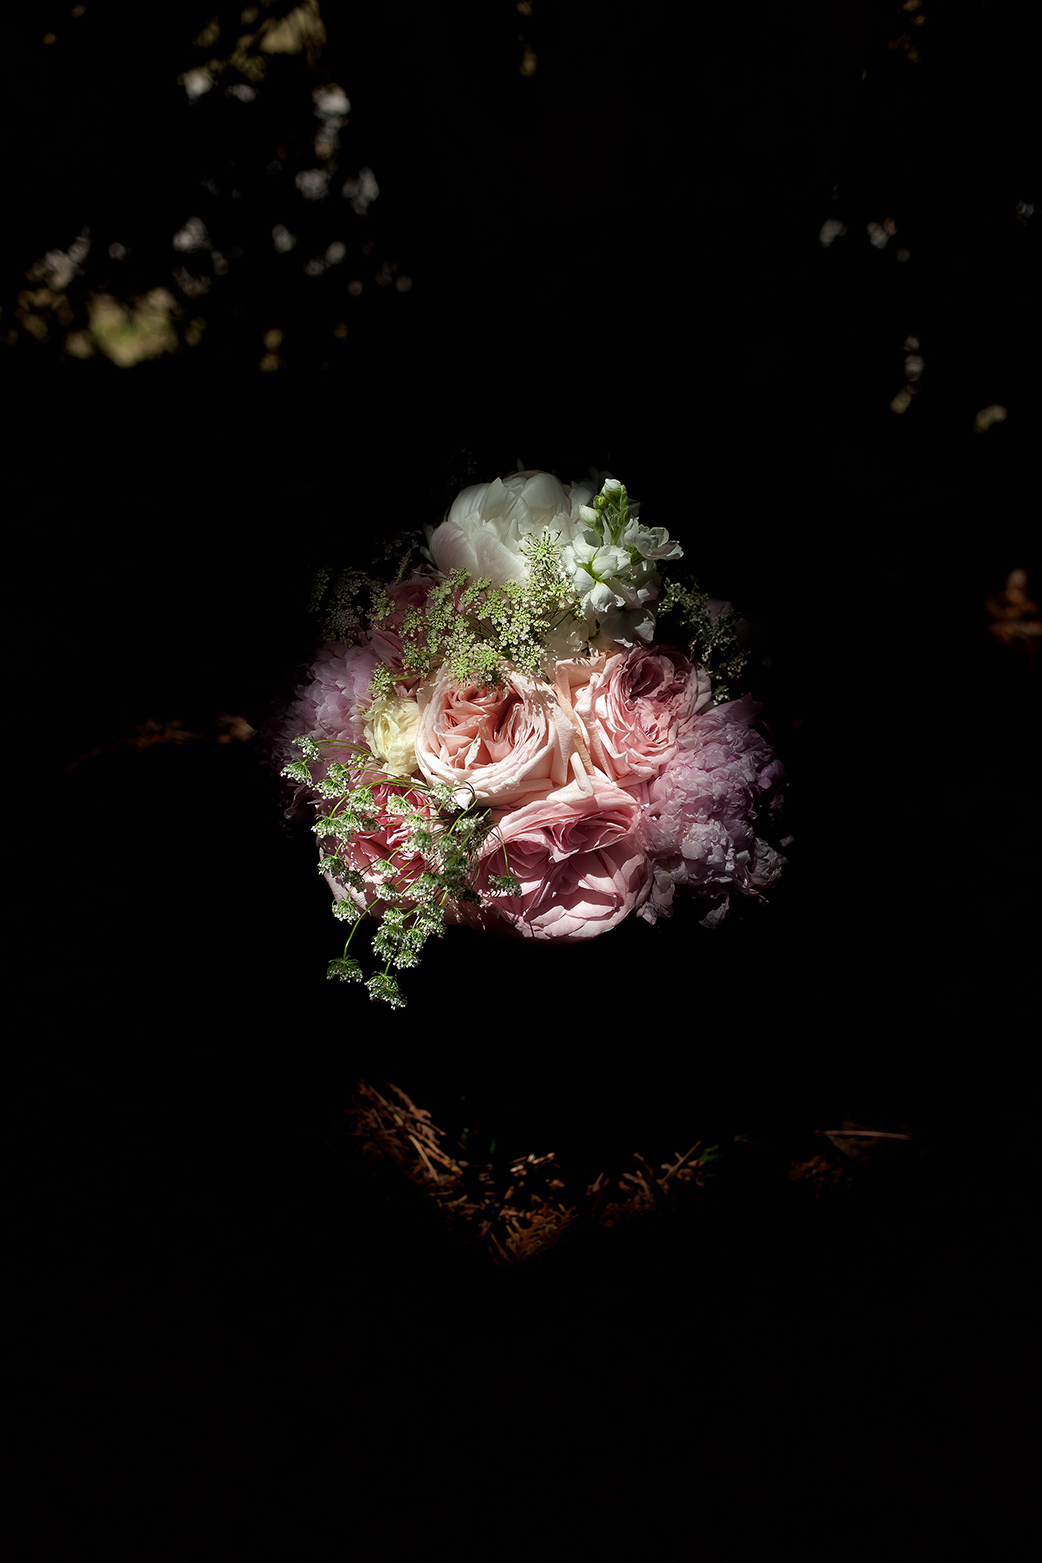 flowers shadow#3(WEB).jpg